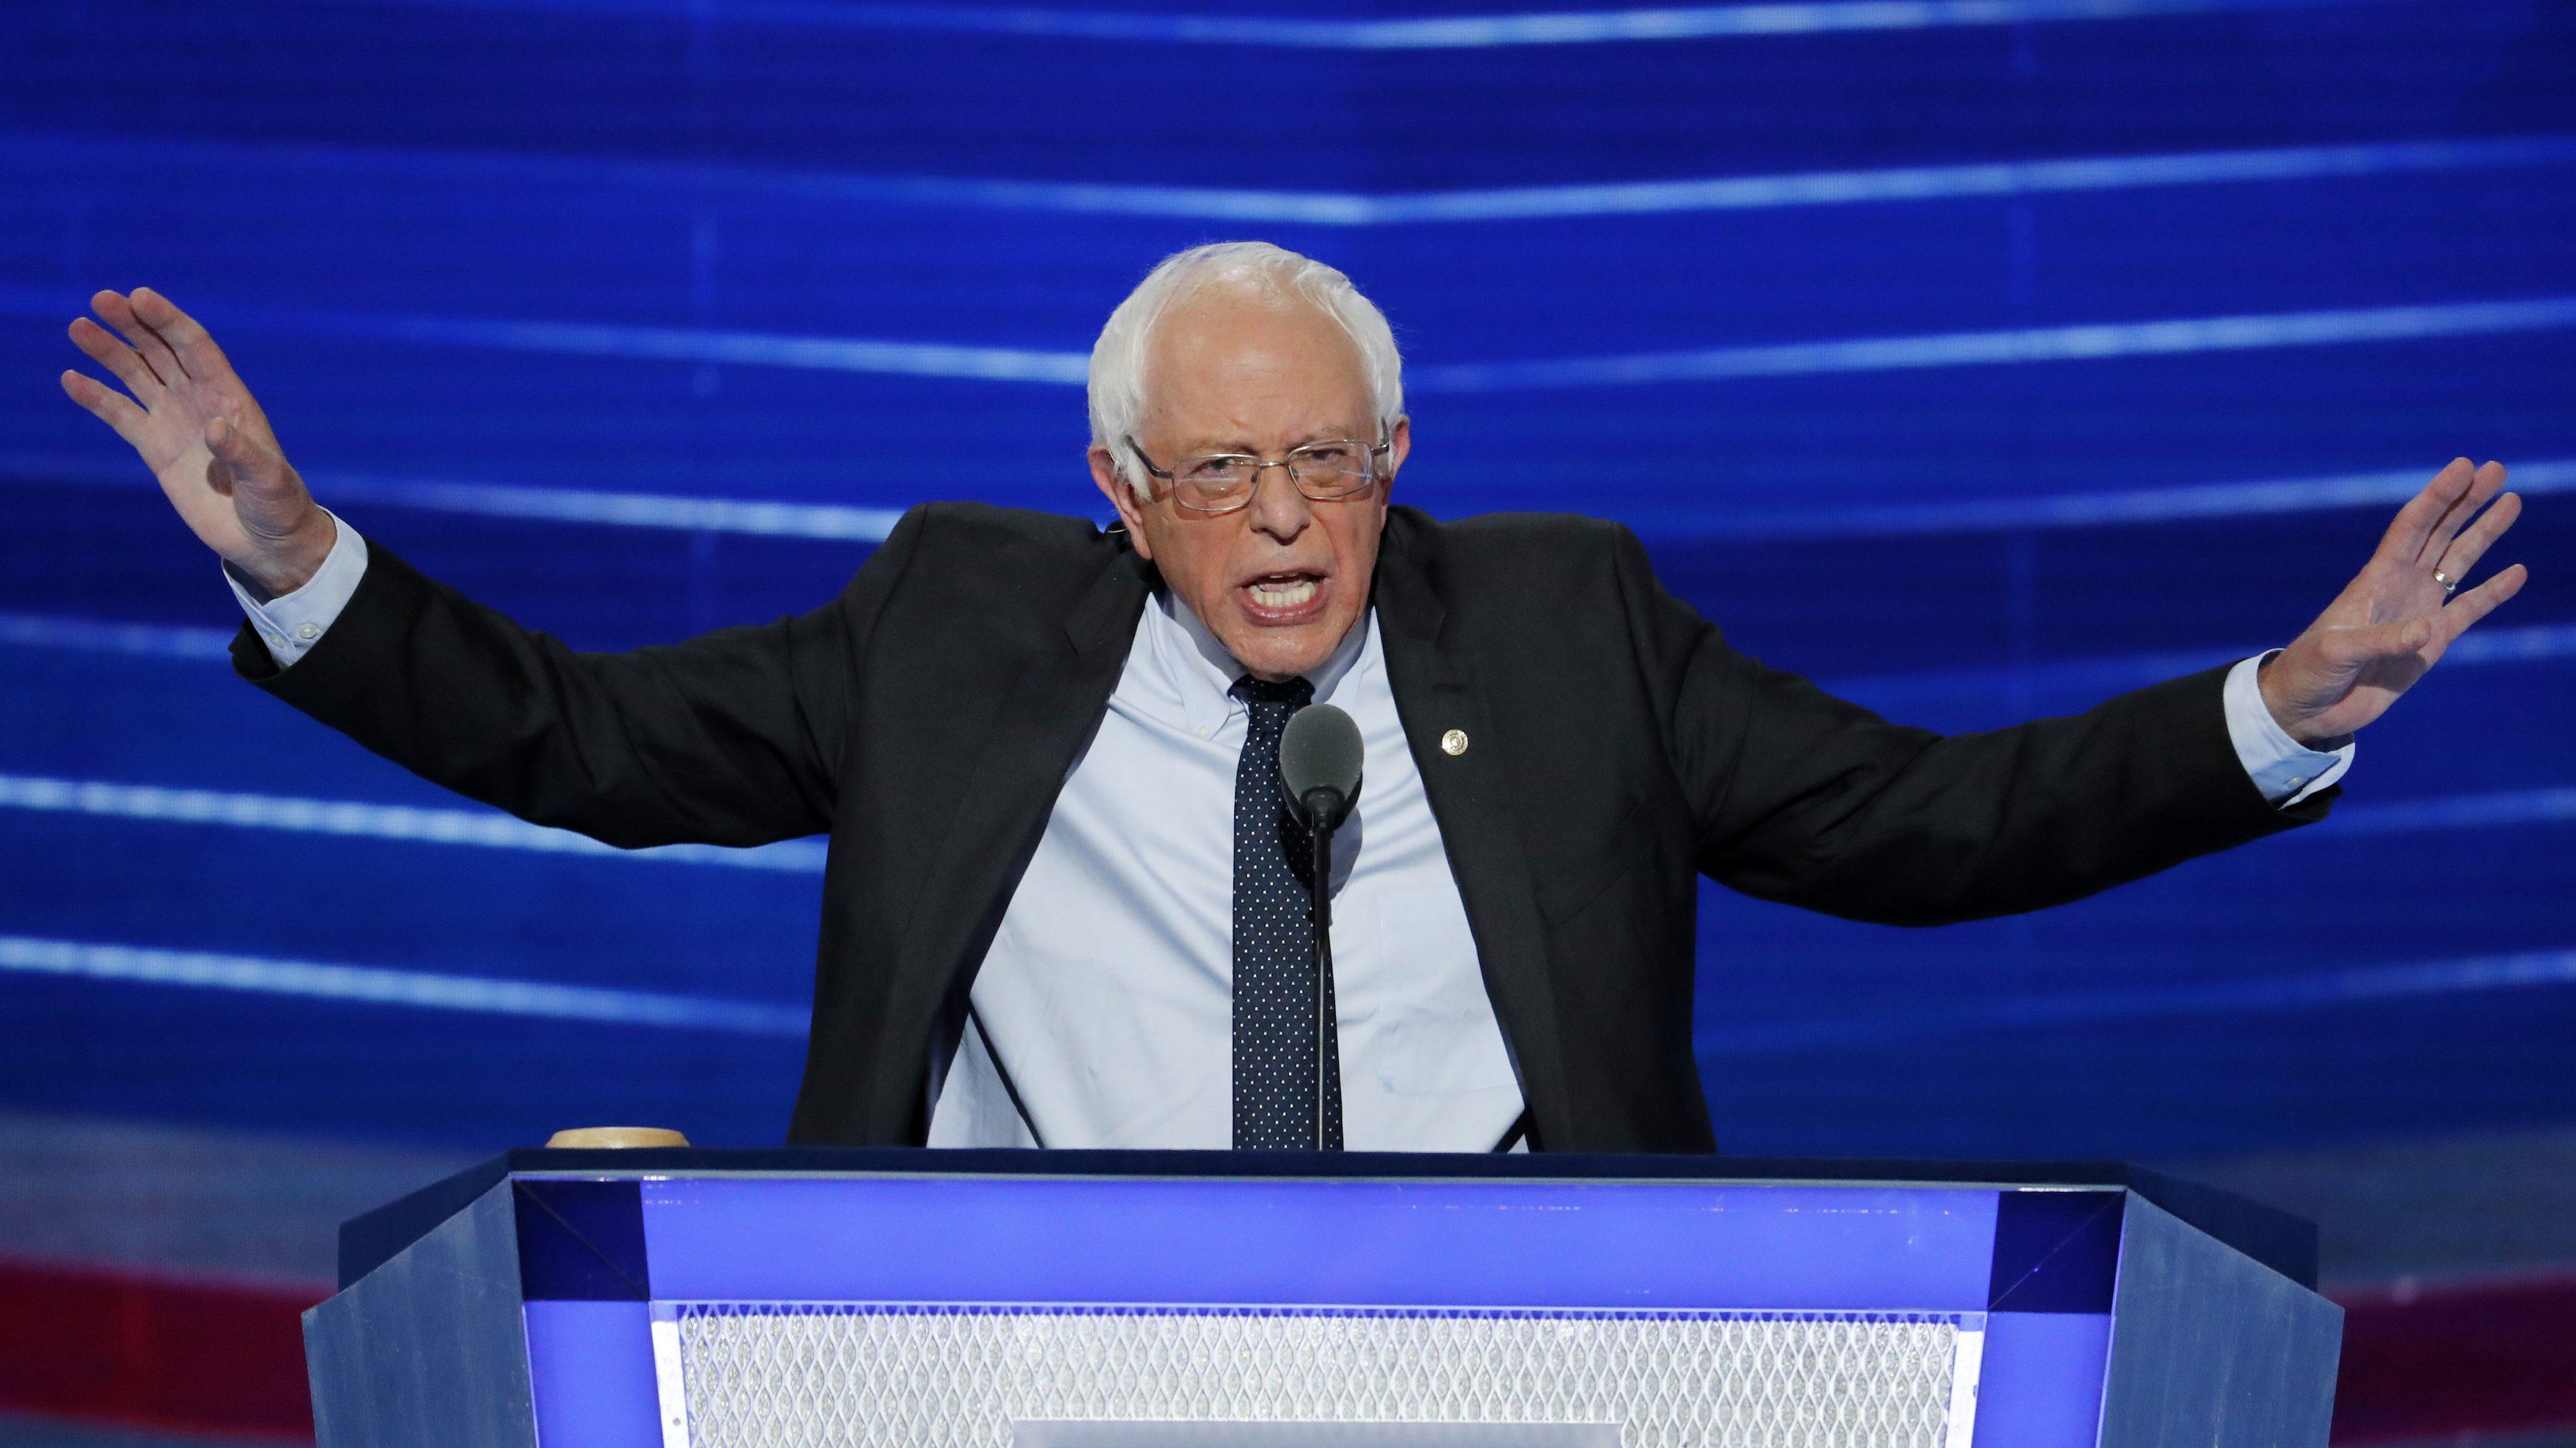 Bernie Sanders at DNC 2016